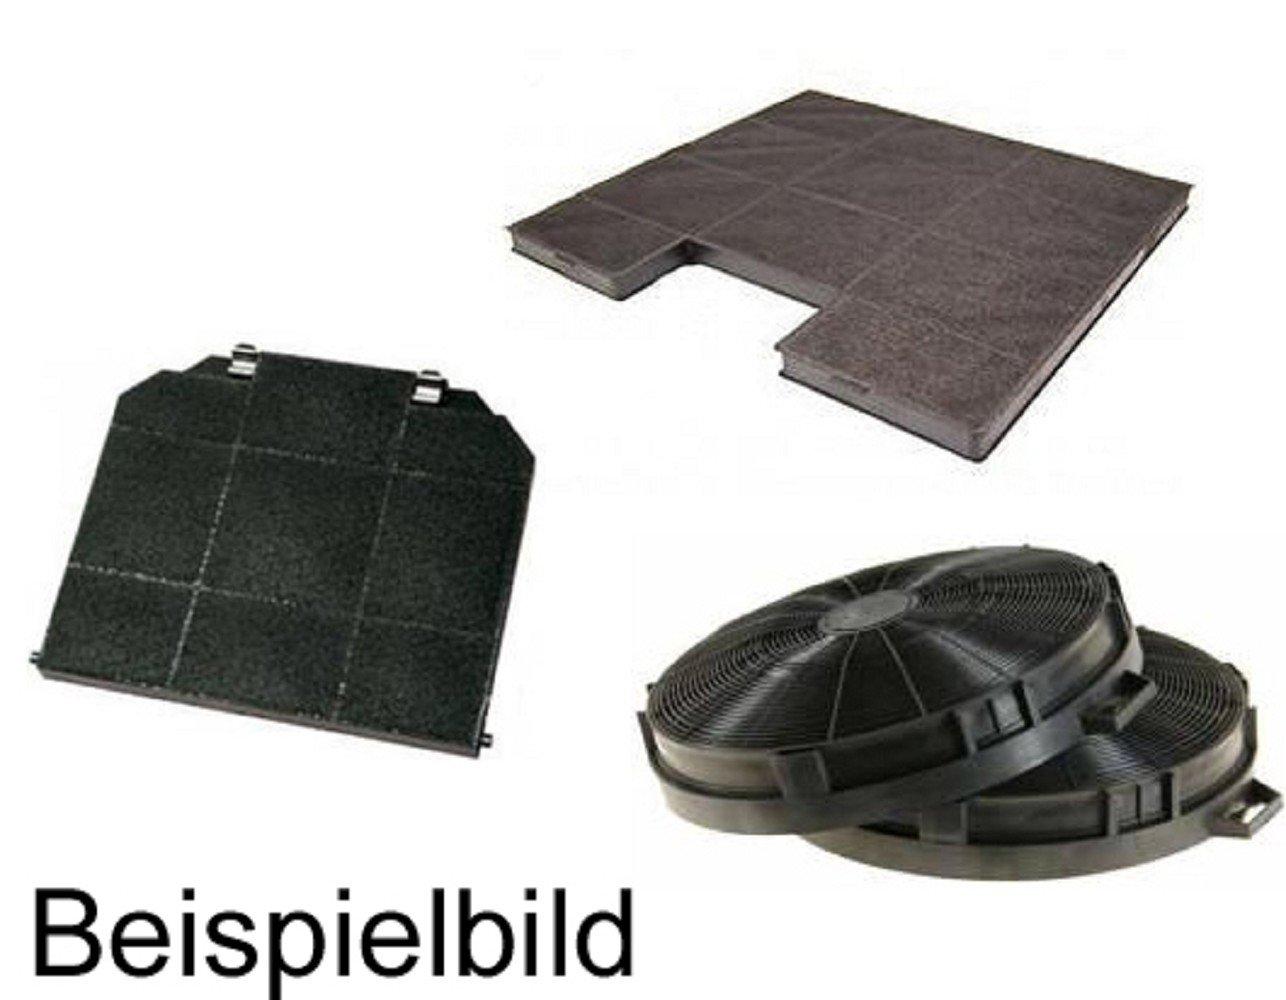 Elica Filtro Carbone per Cappa Elisummer / Totem F00173/1S